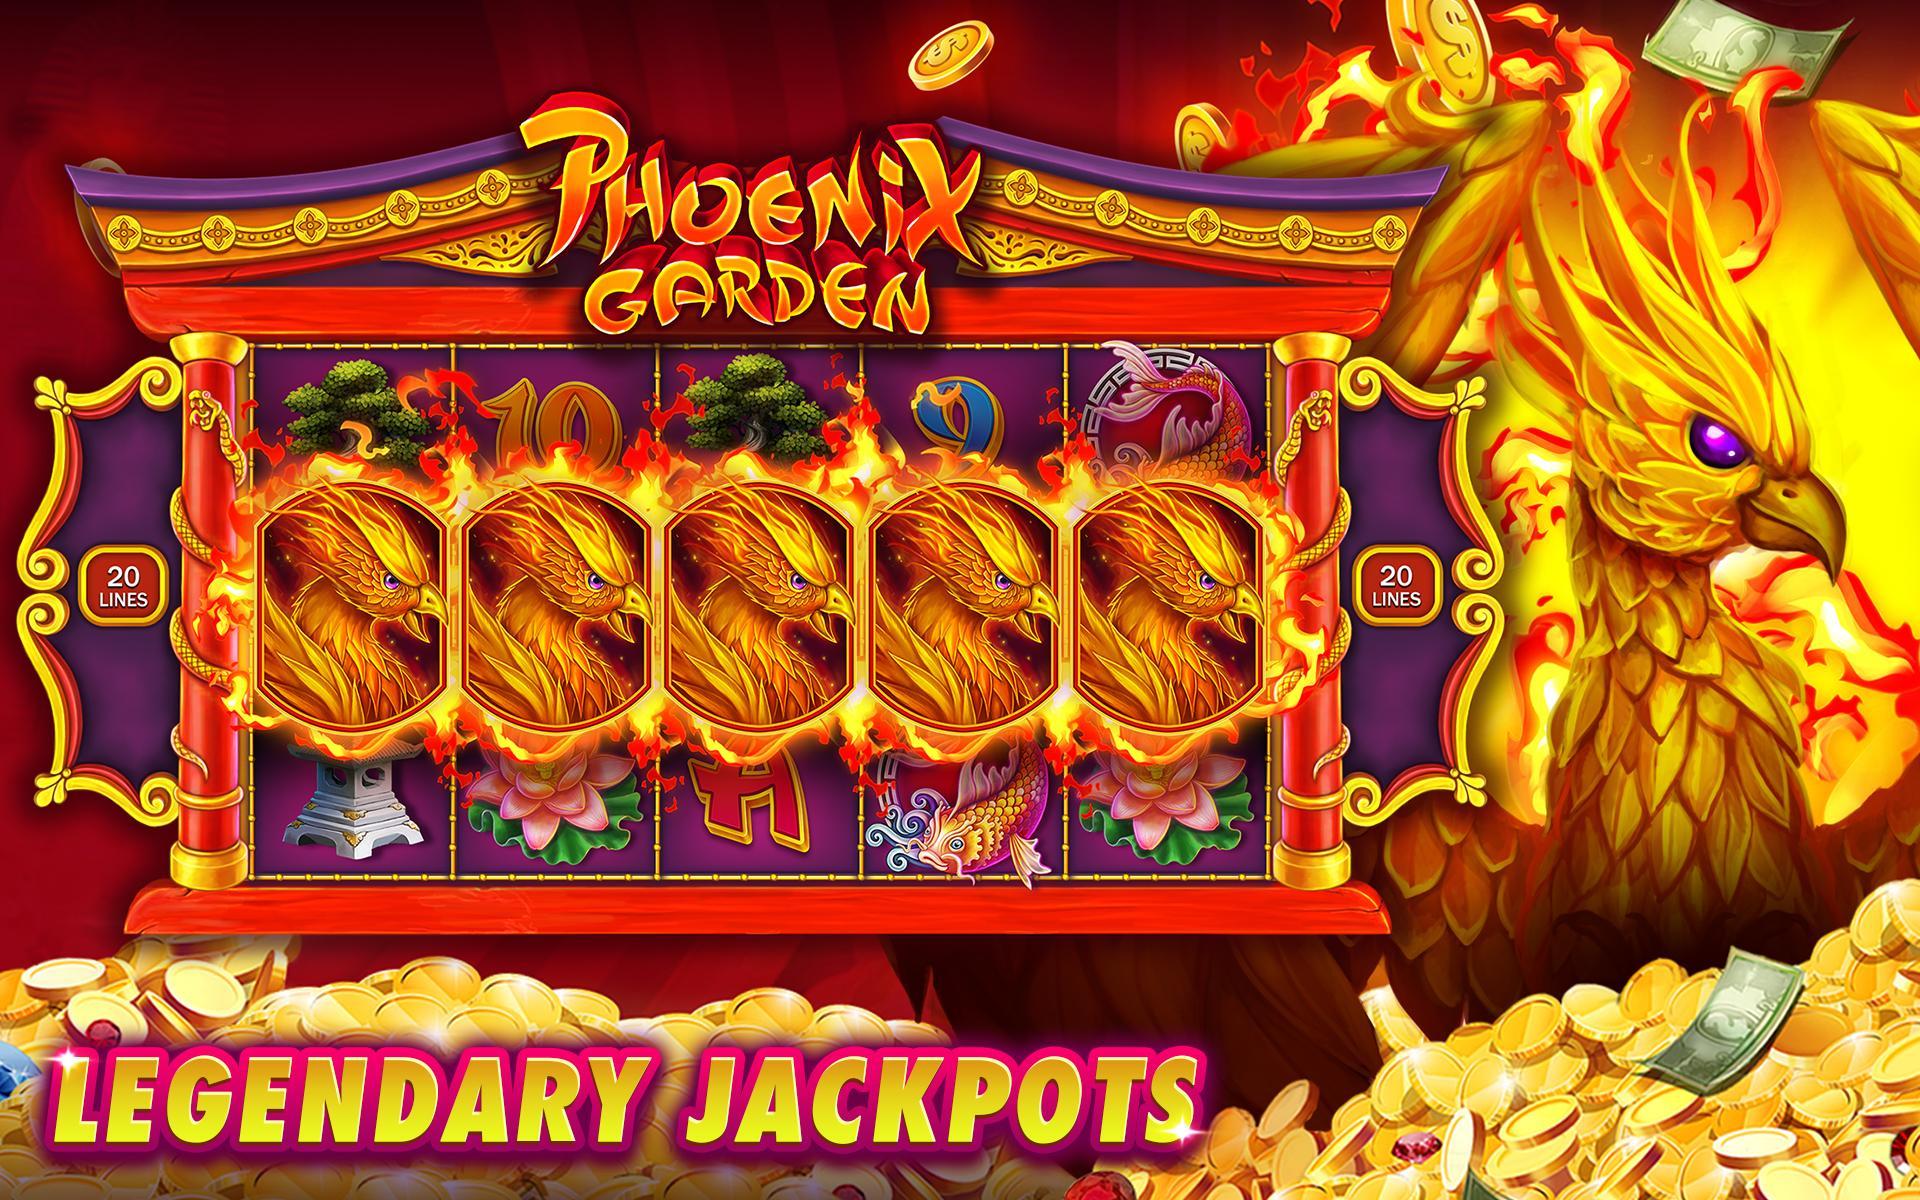 Download Billionaire Casino™ Slots 777 on PC with BlueStacks